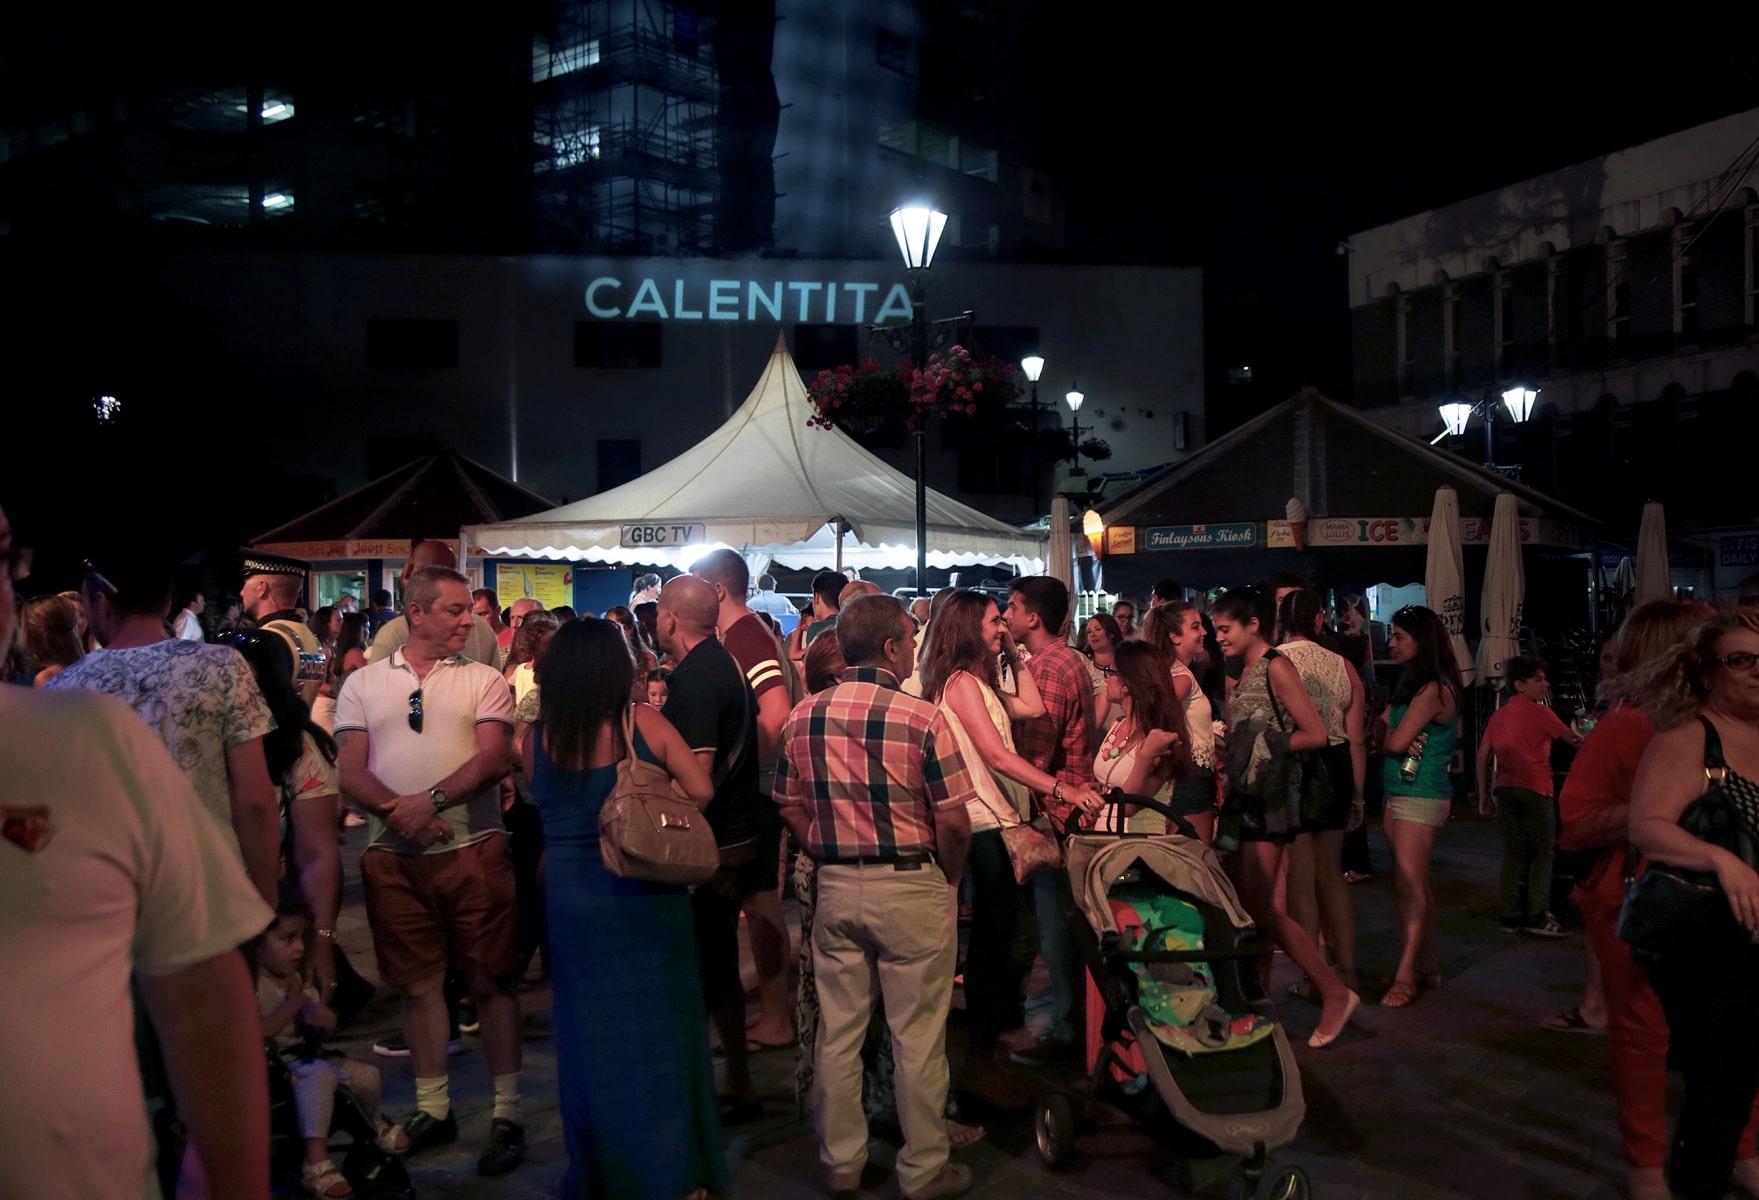 18-jun-2016-noche-de-la-calentita-en-gibraltar_27799757576_o